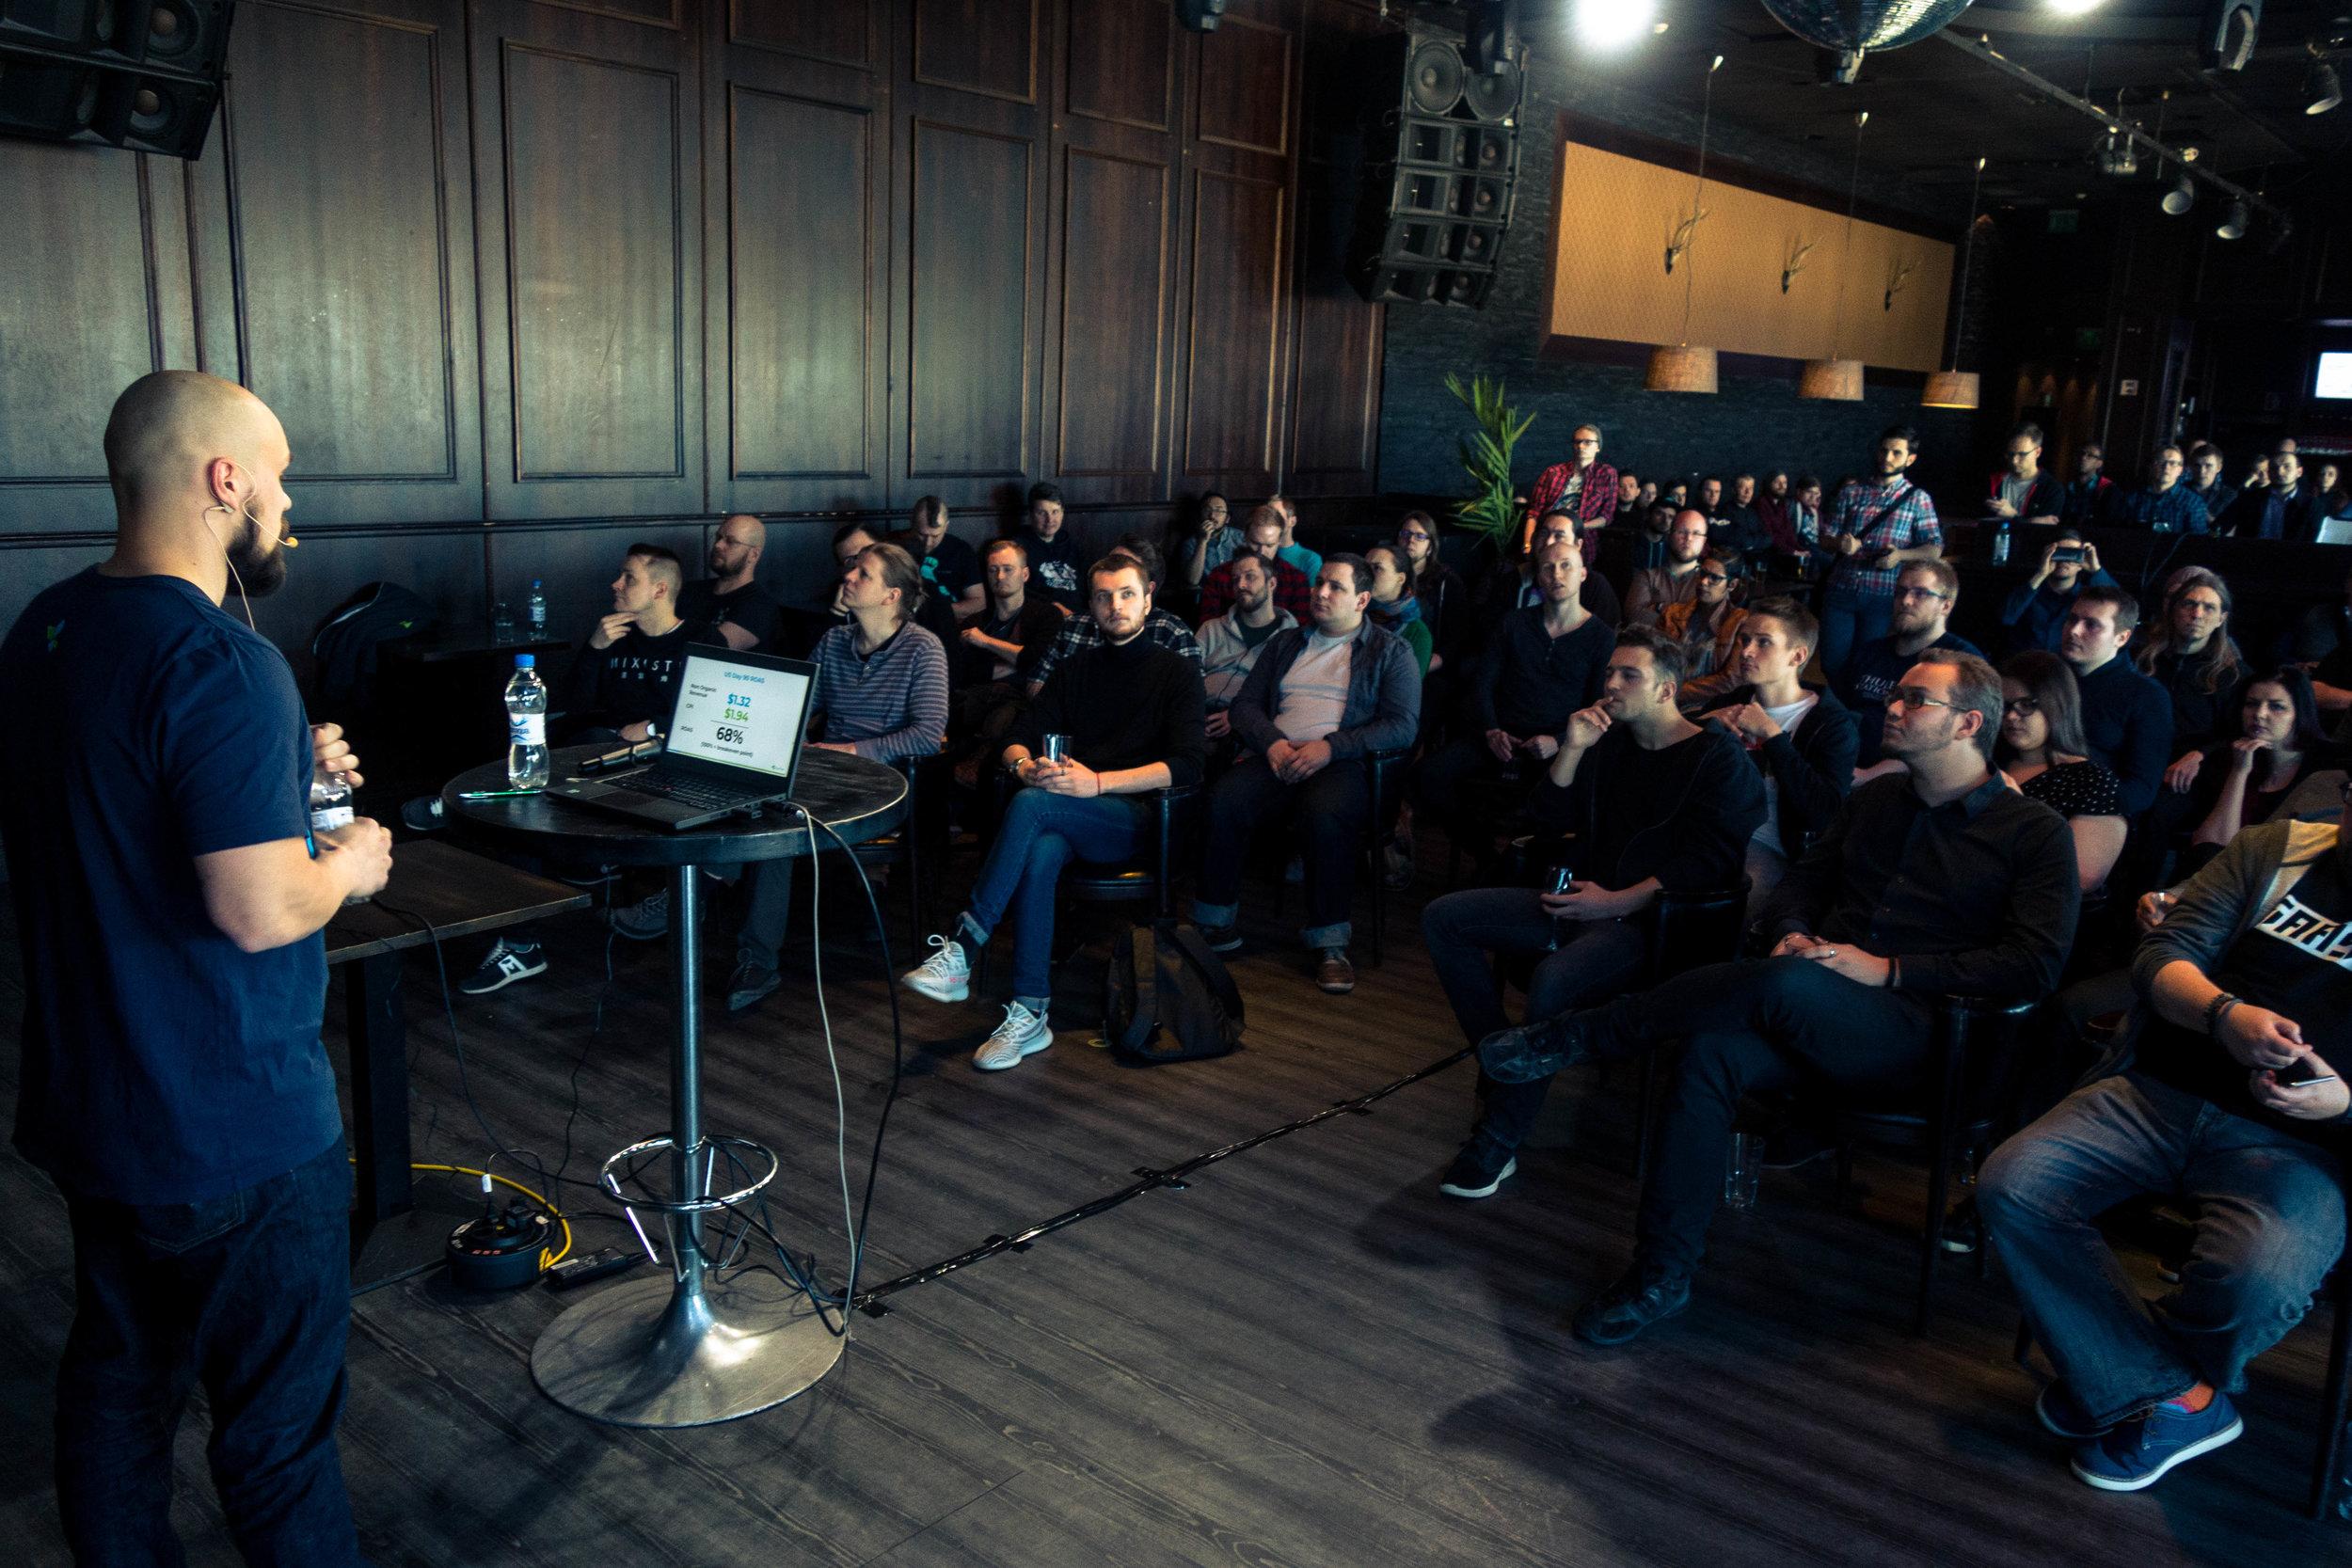 Patrik Lehti addressing the audience. Photo by Casimir Kuusela